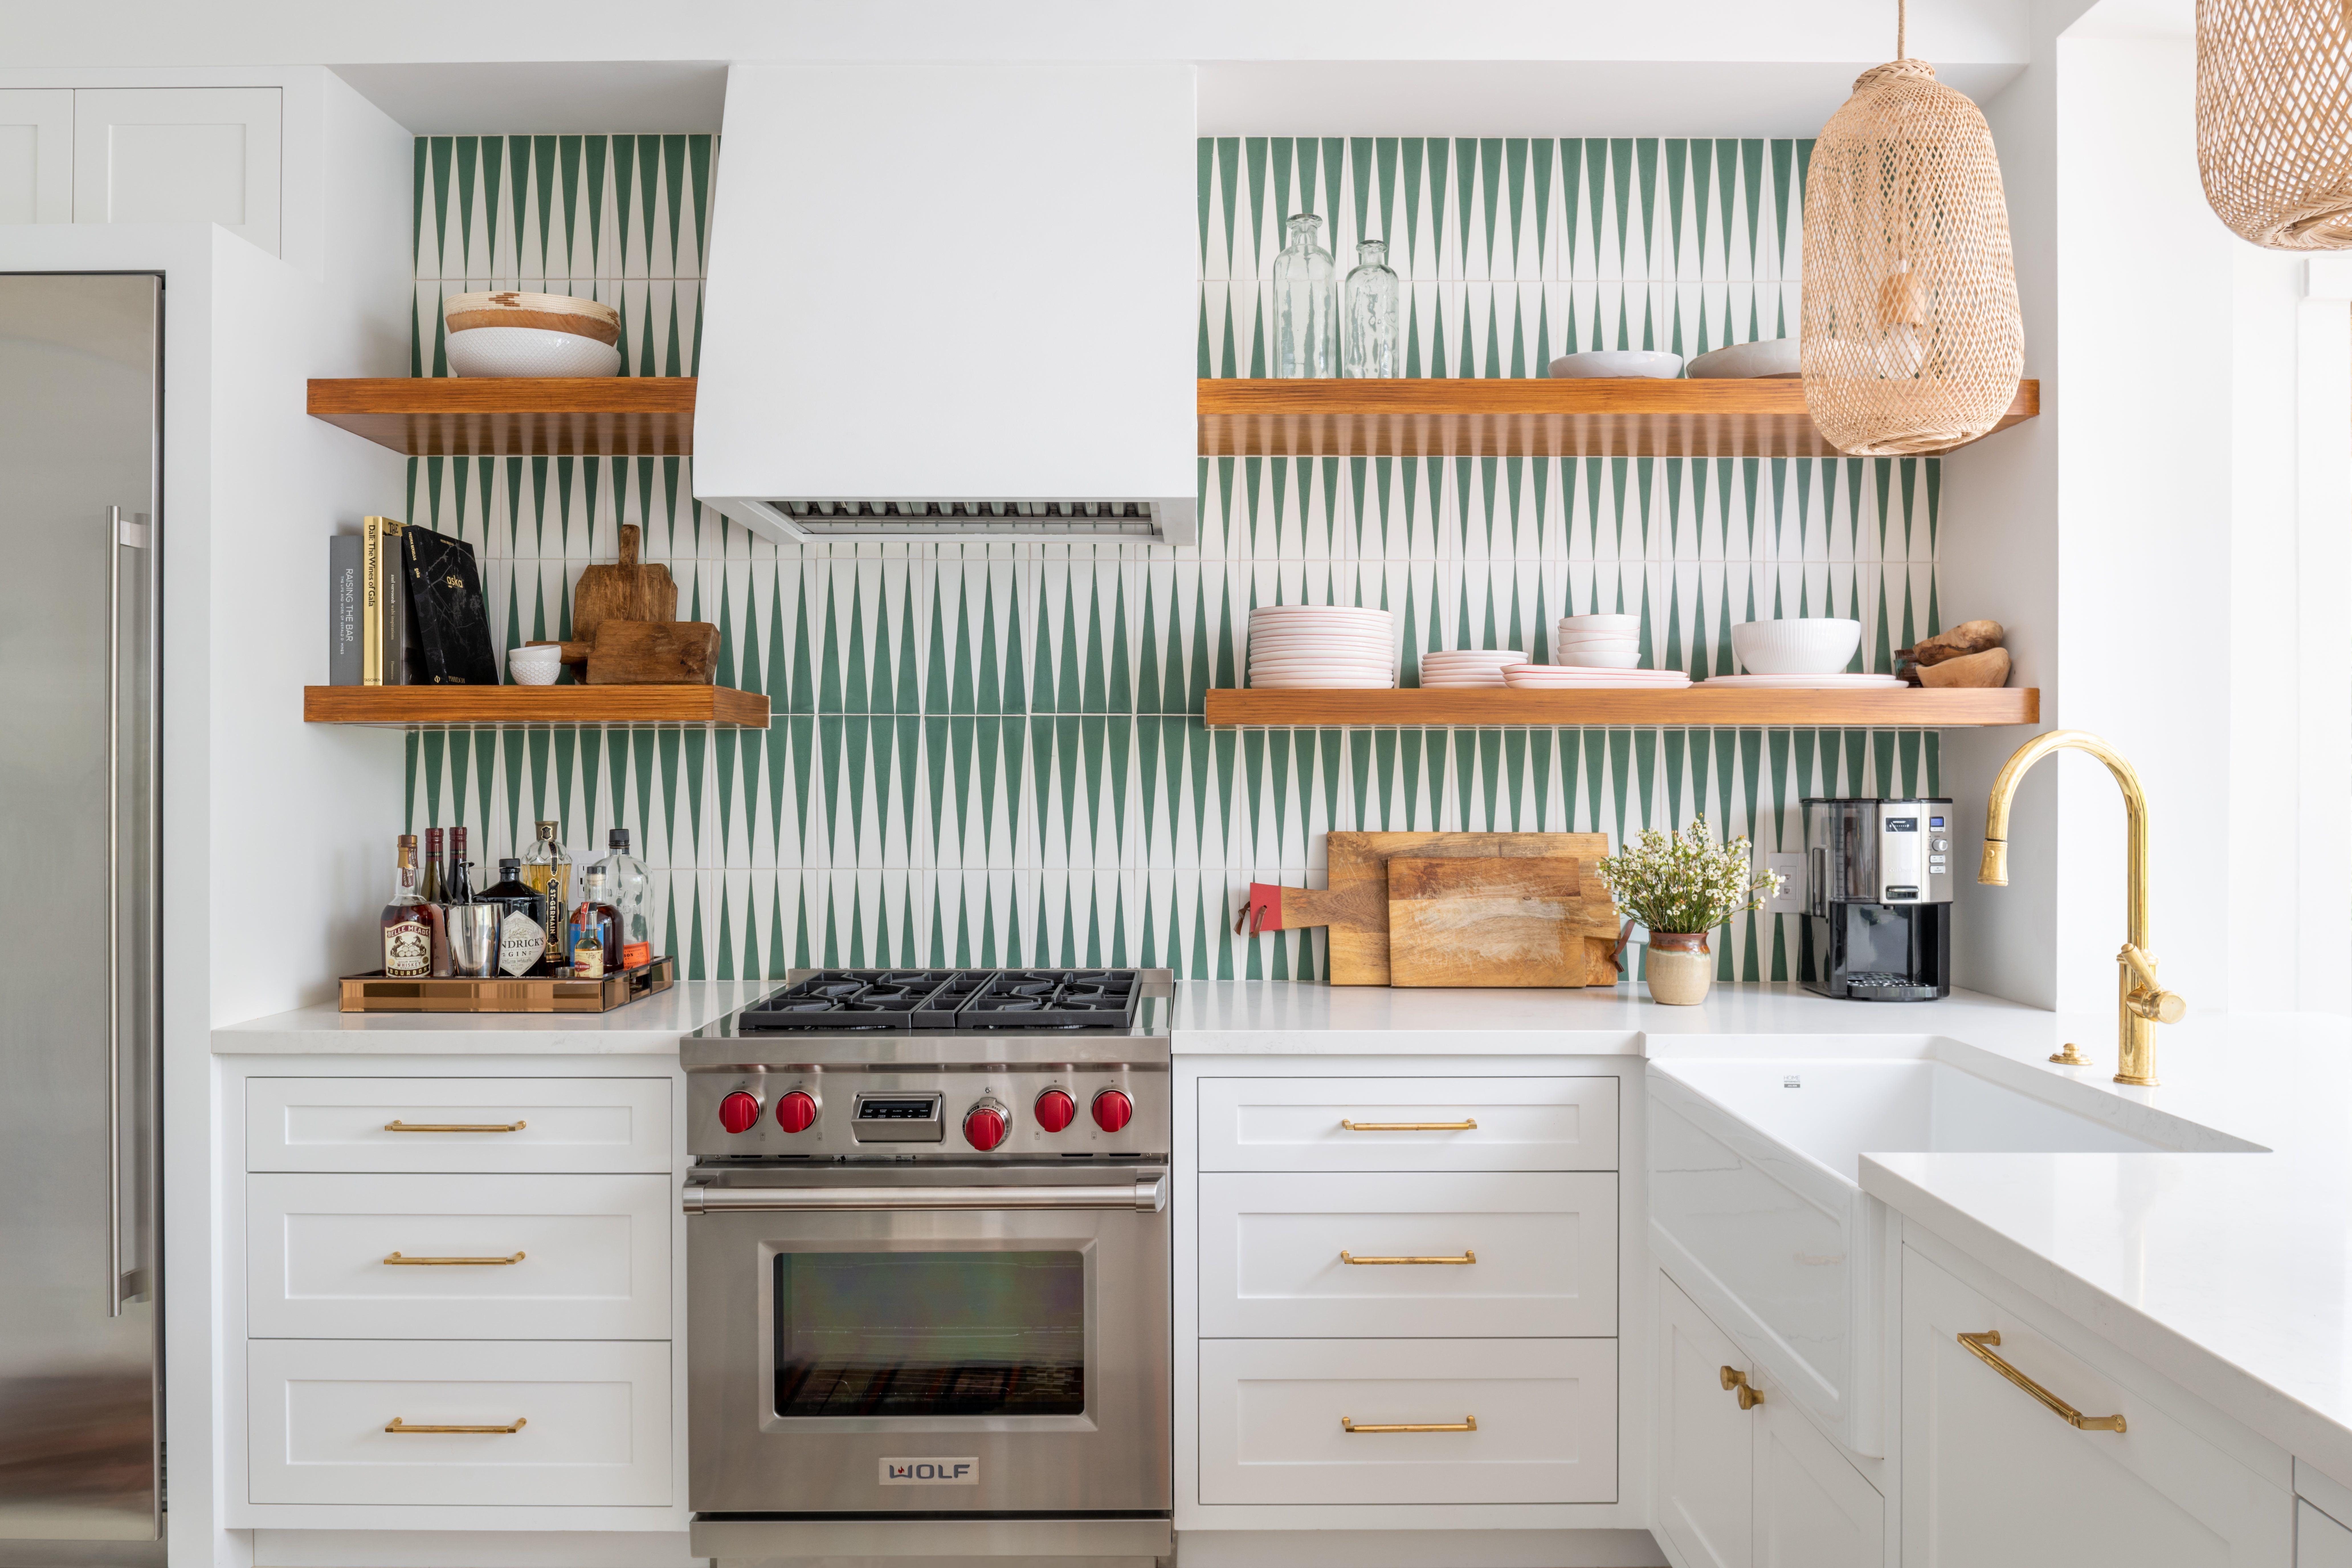 Creative Geometric Kitchen Backsplashes Geometric Backsplash Ideas